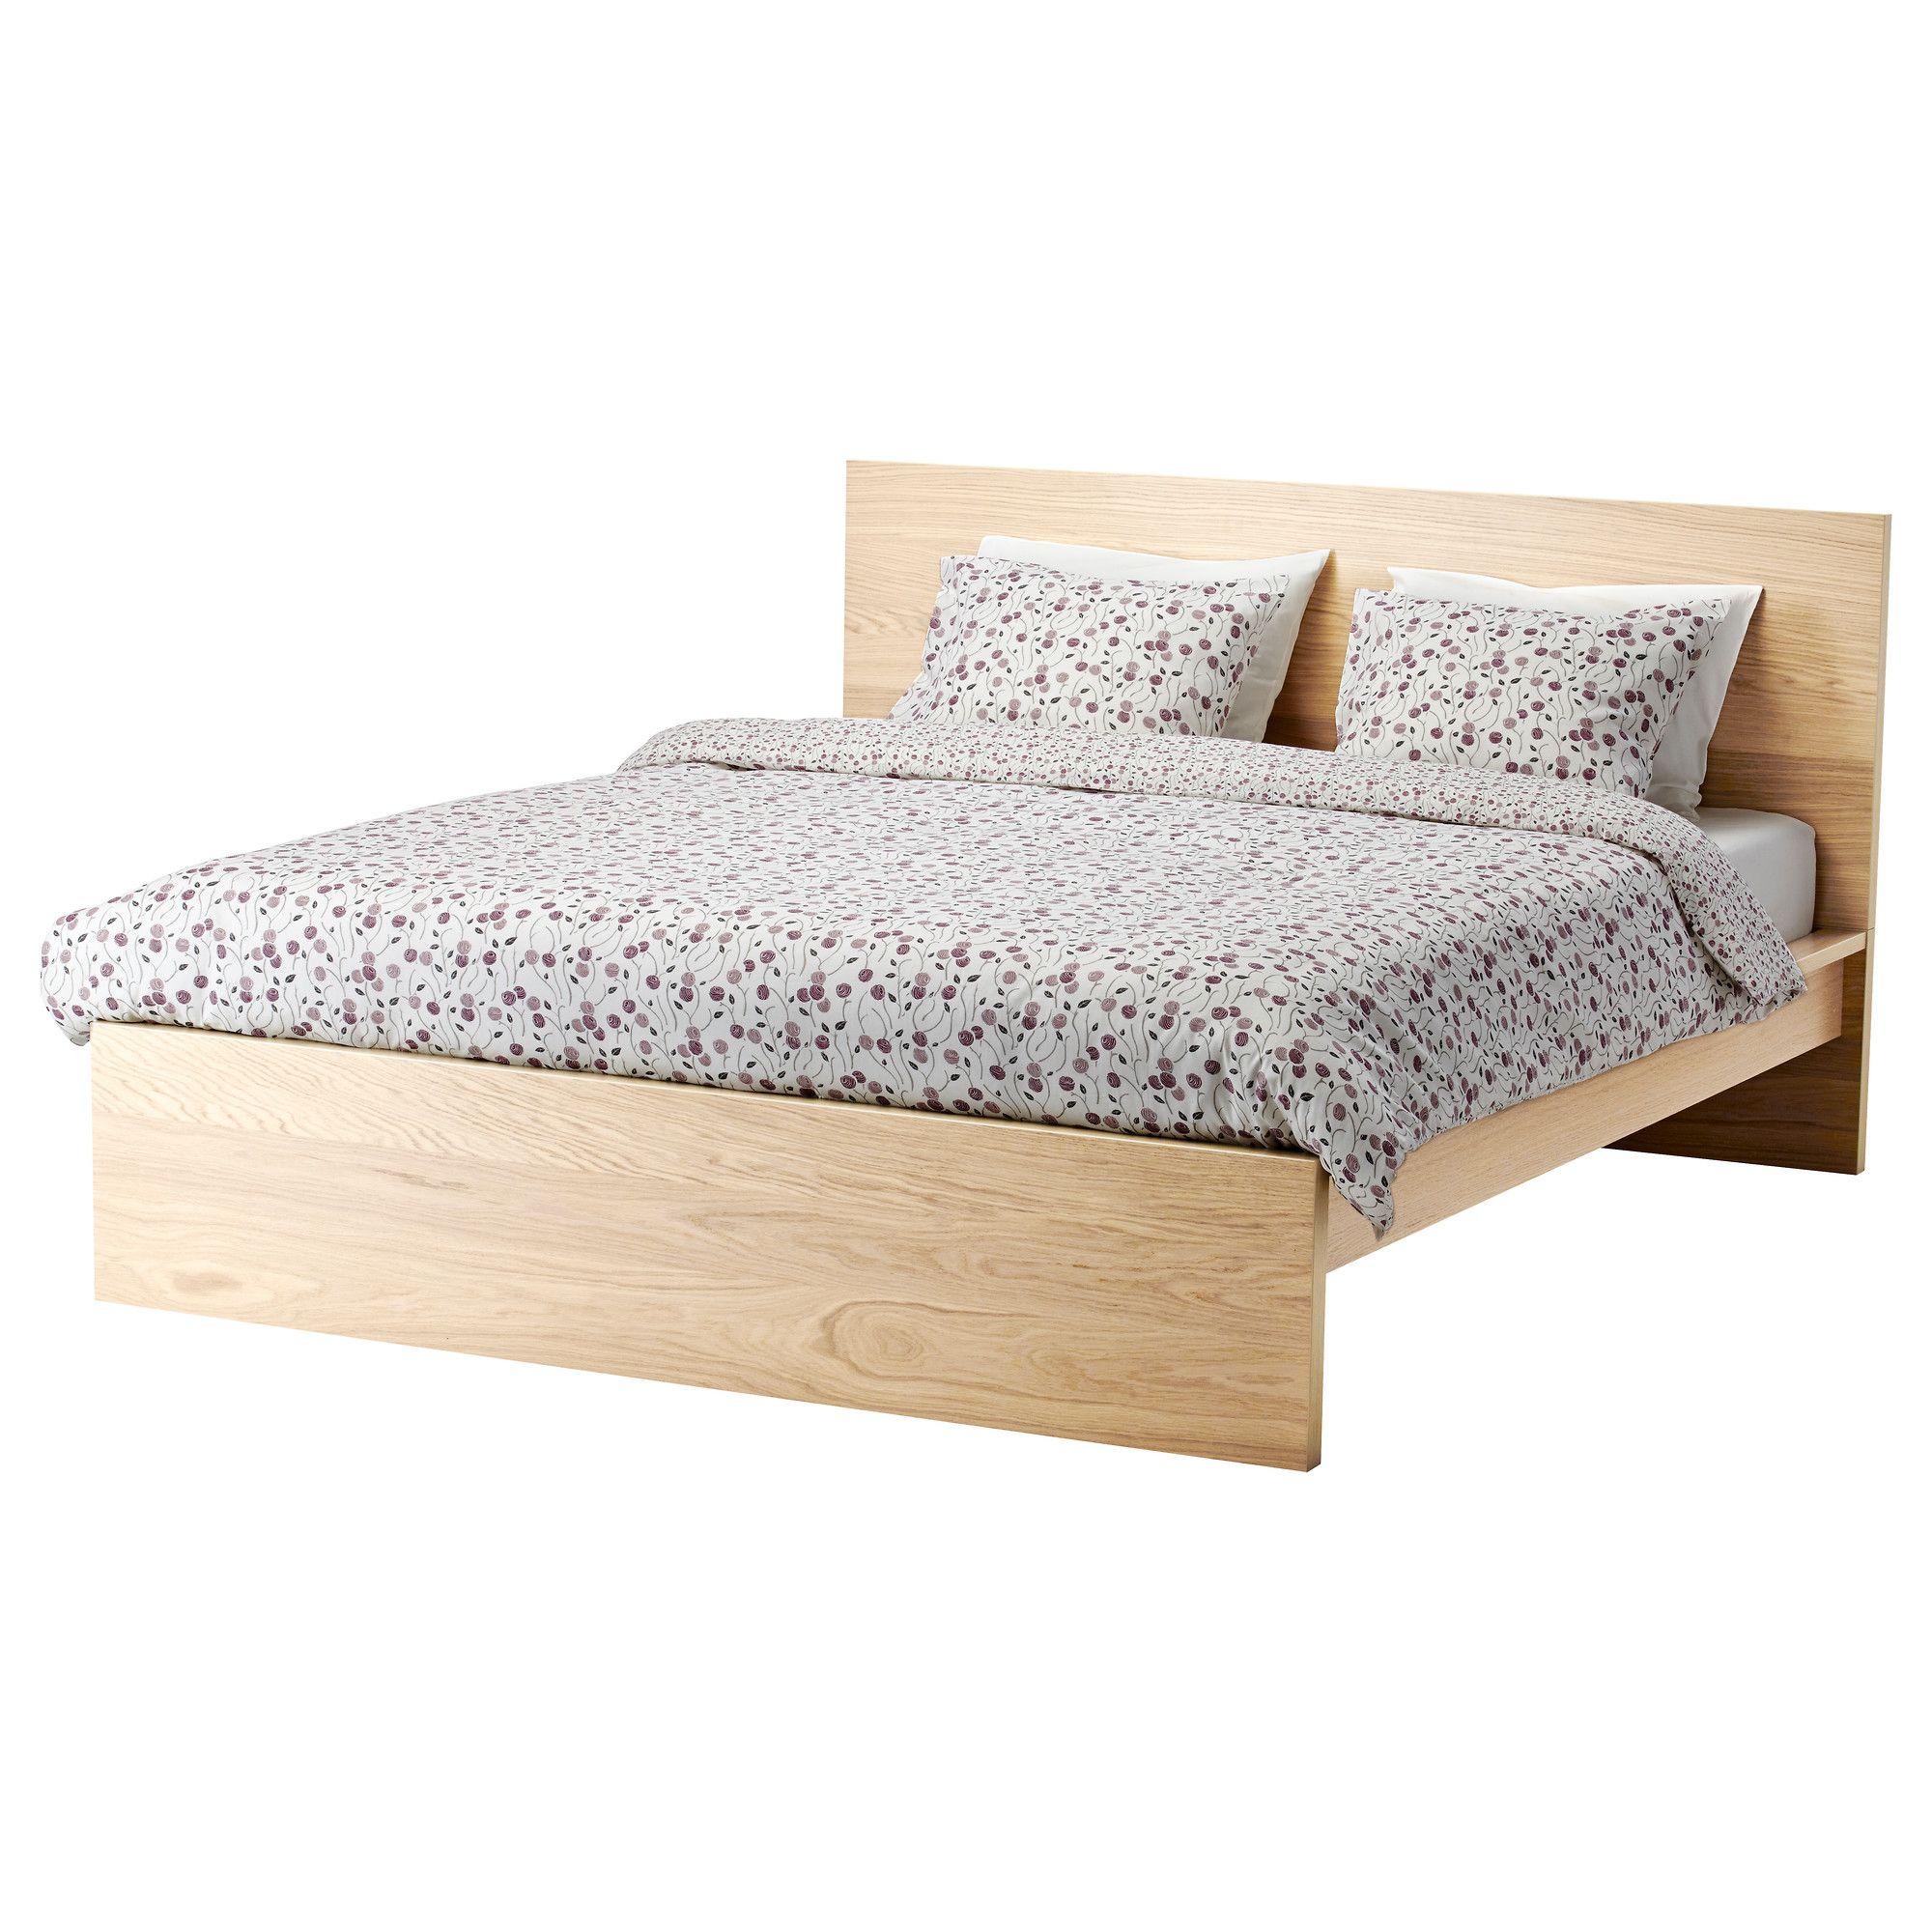 Best Ikea Malm Bed Frame High White Stained Oak Veneer 640 x 480